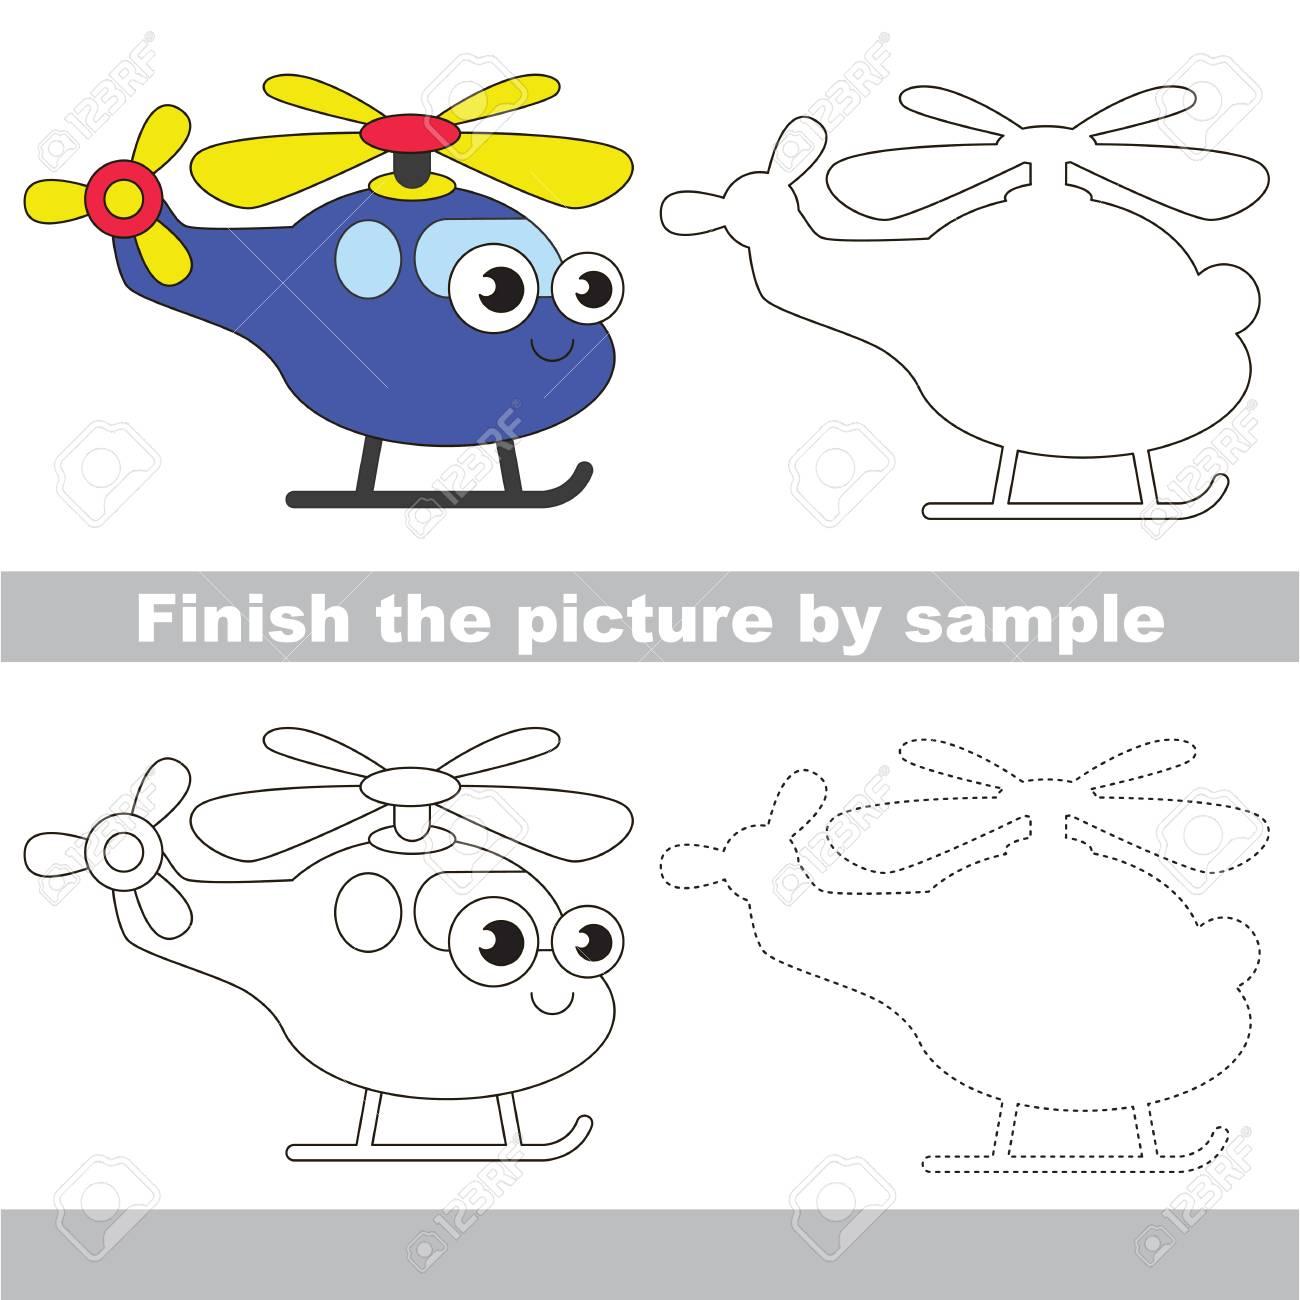 Drawing Worksheet For Children Easy Educational Kid Game Simple